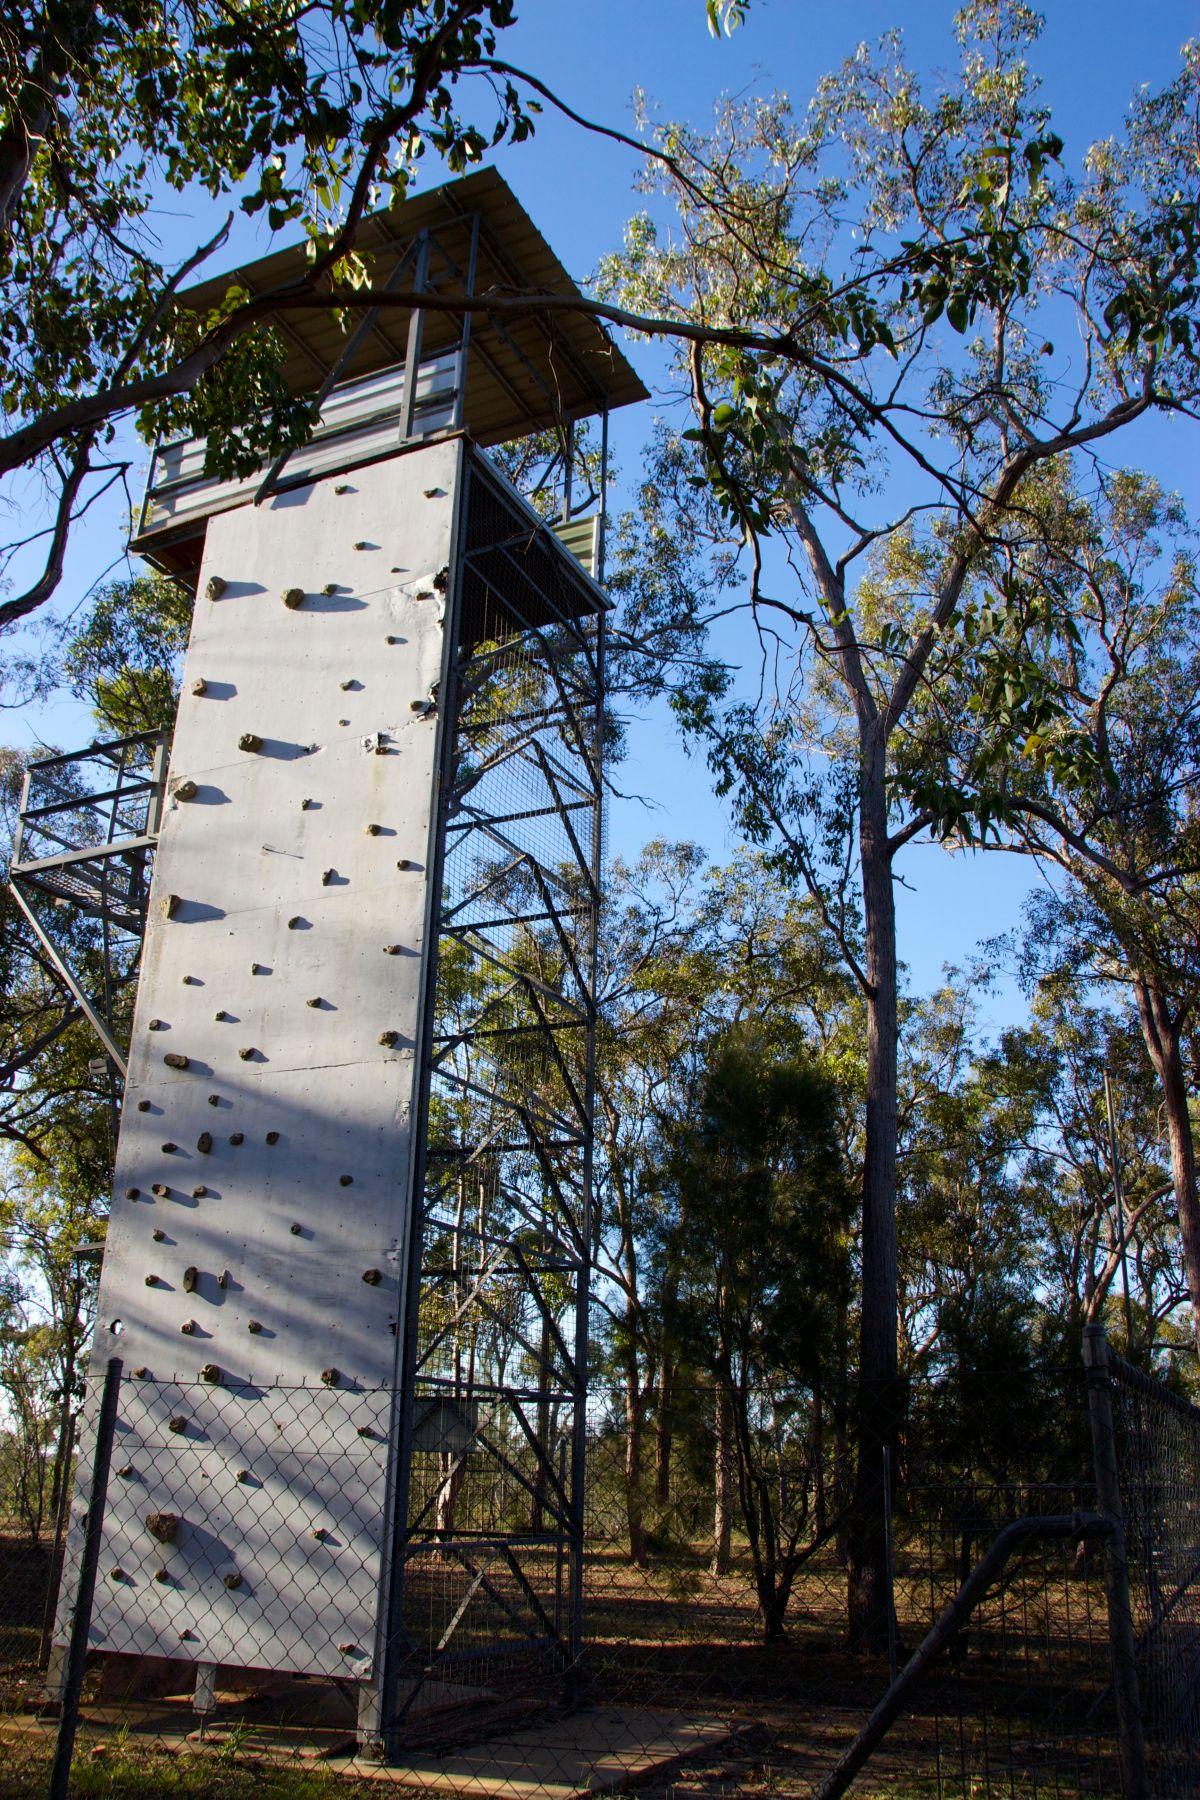 Wyper Scout Park,Bundaberg